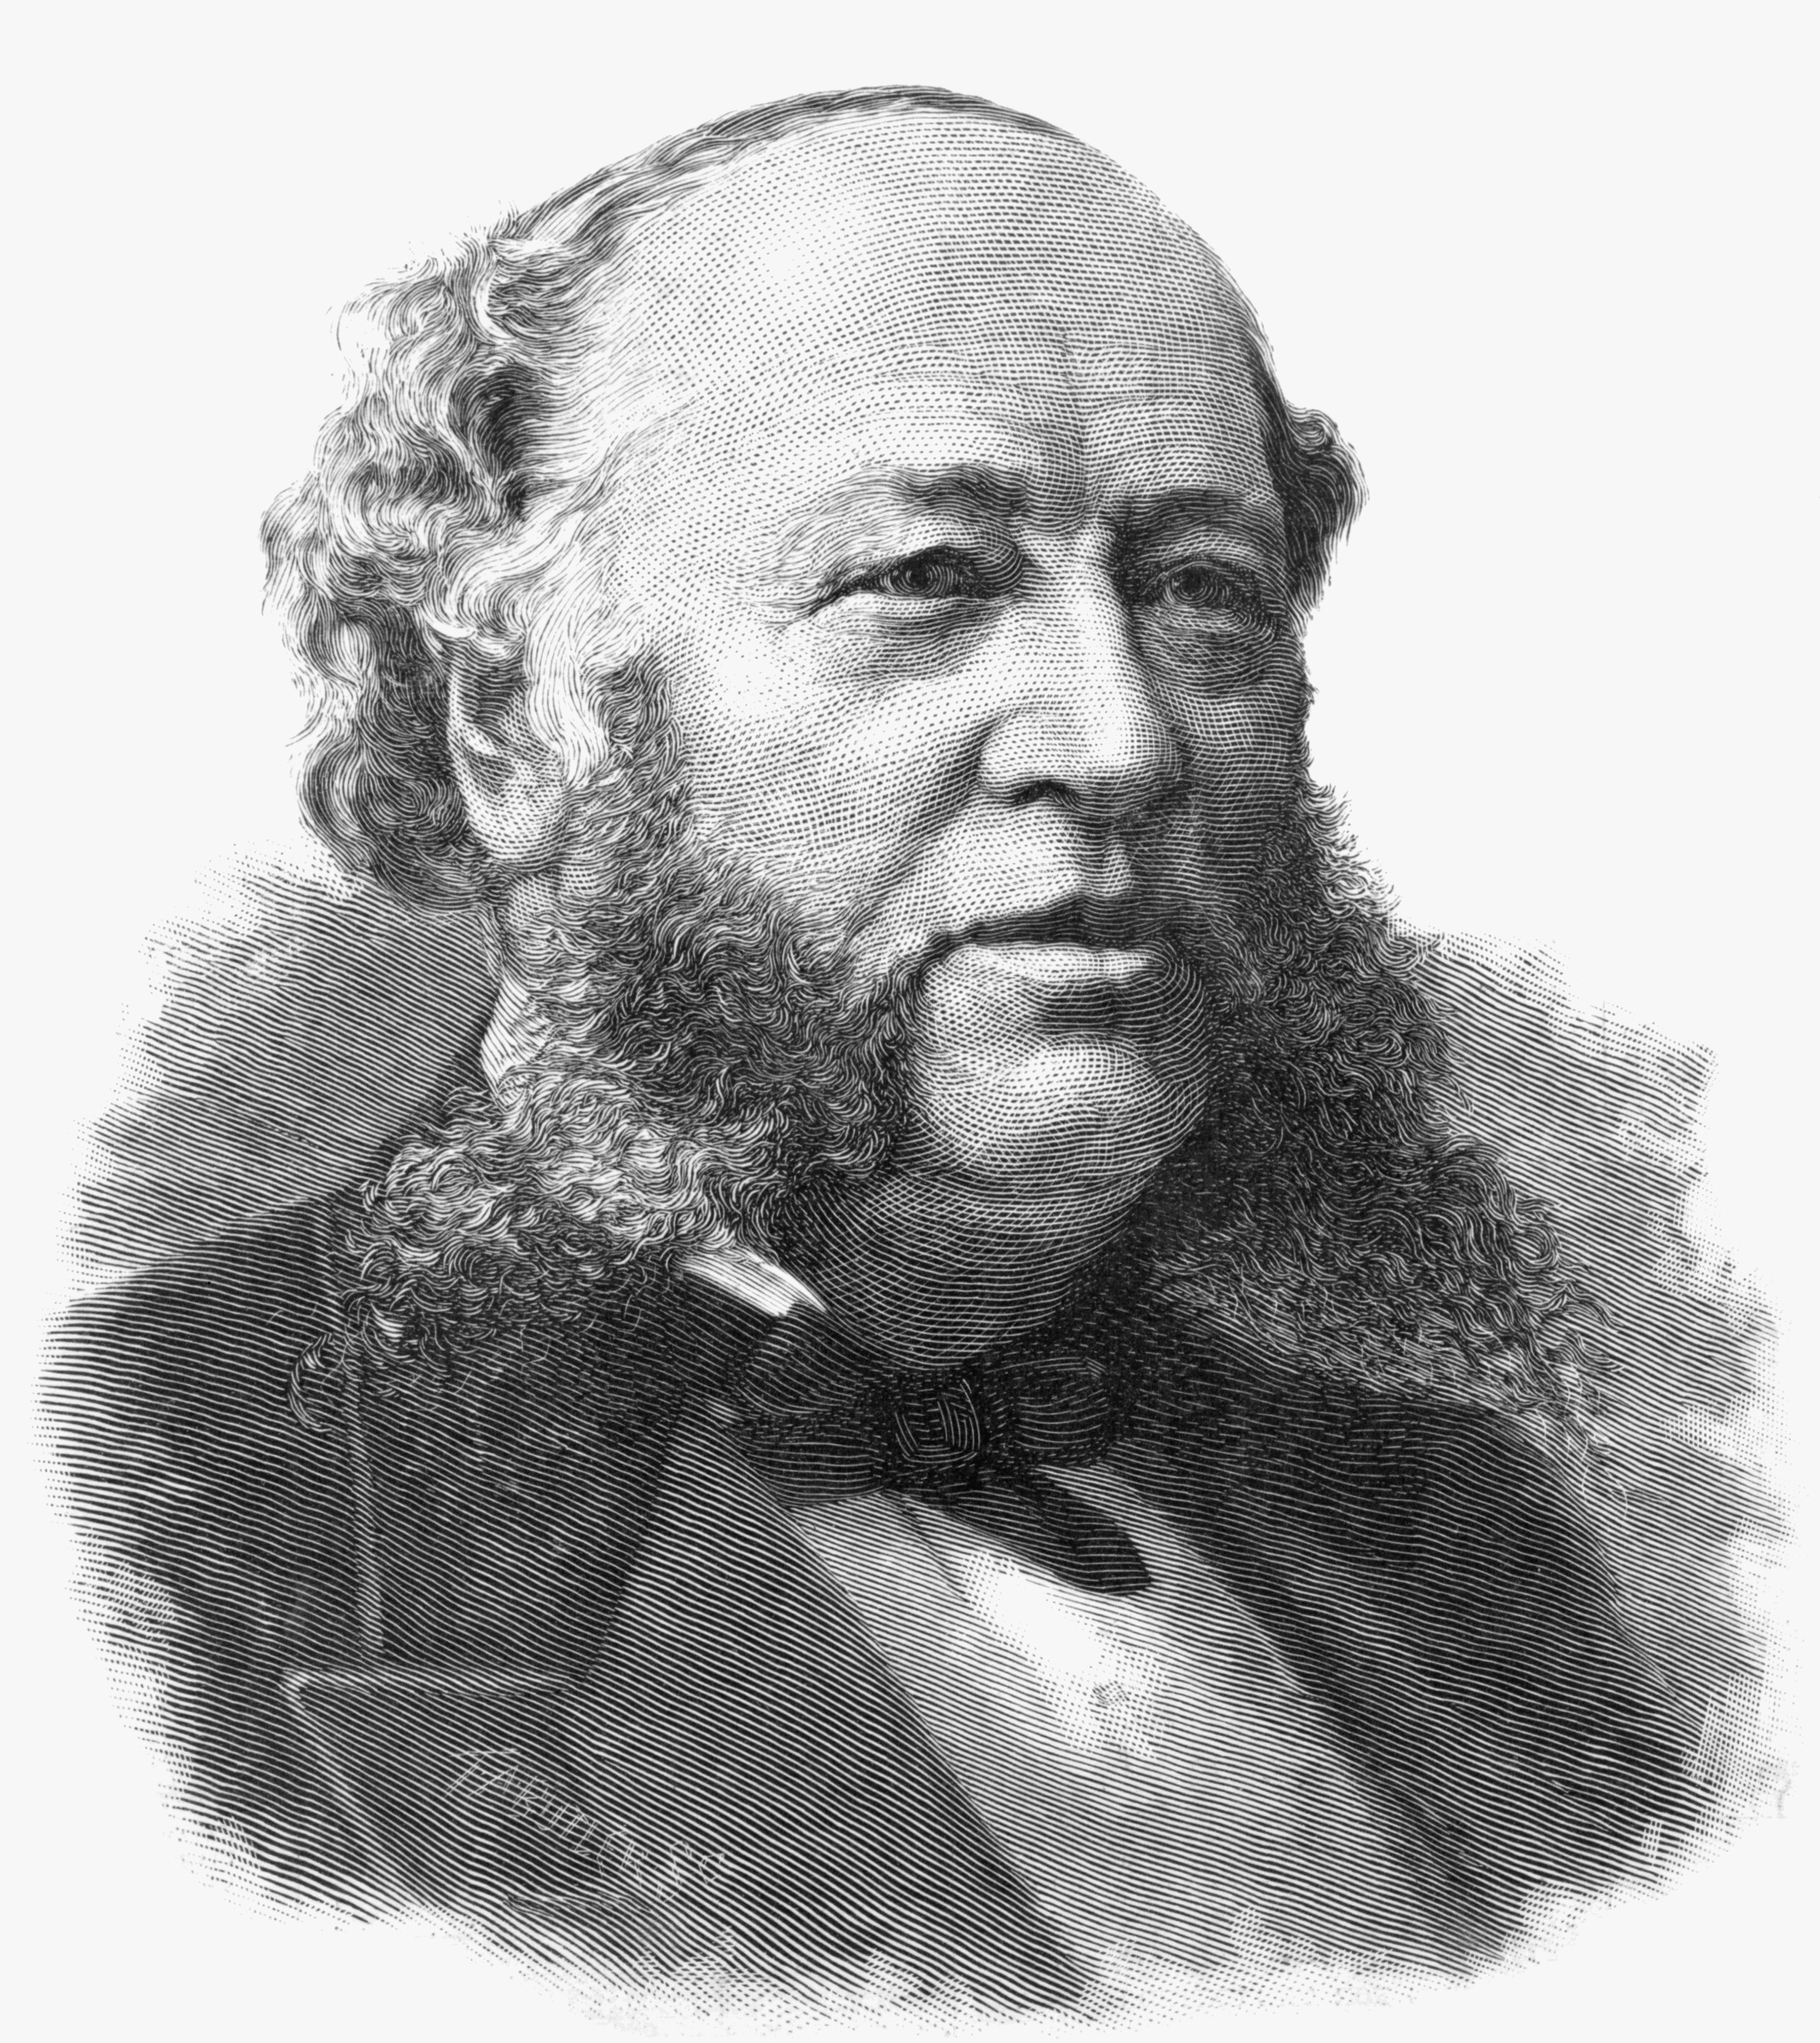 https://upload.wikimedia.org/wikipedia/commons/c/ce/William_H_Vanderbilt.jpg